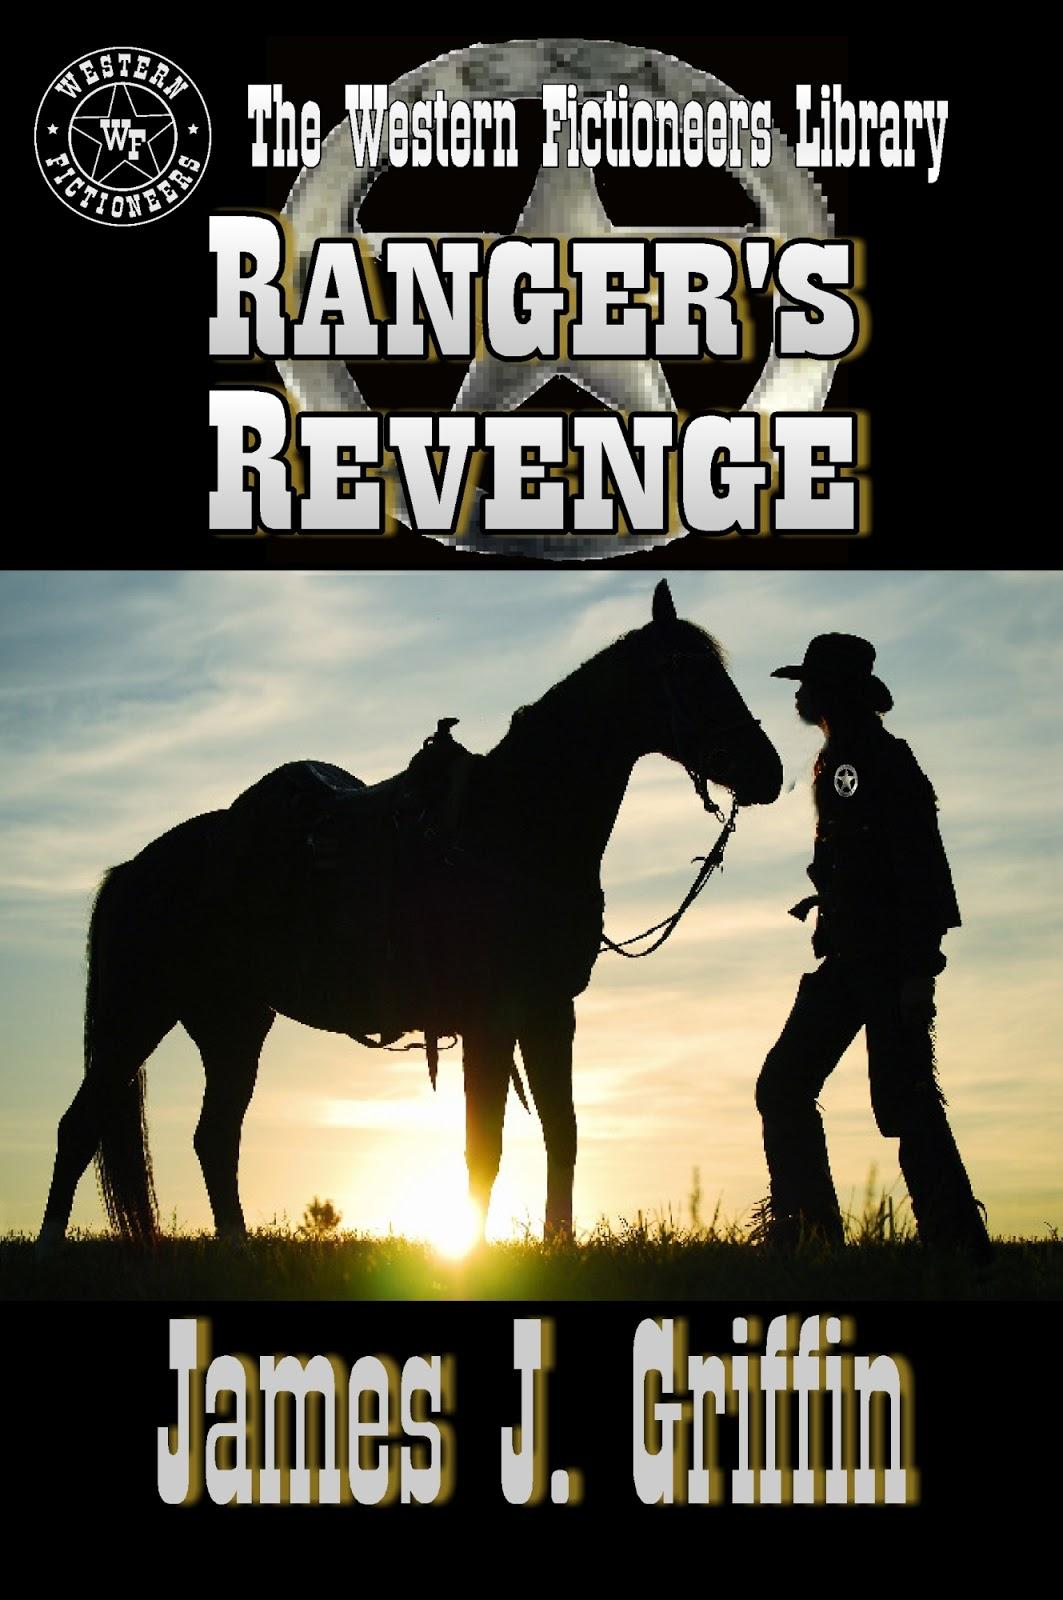 http://4.bp.blogspot.com/-QakYgb5YgkA/US_l9BZhIxI/AAAAAAAAAmA/Cp2SQEwpEHI/s1600/Rangers+Revenge+Griffin.jpg